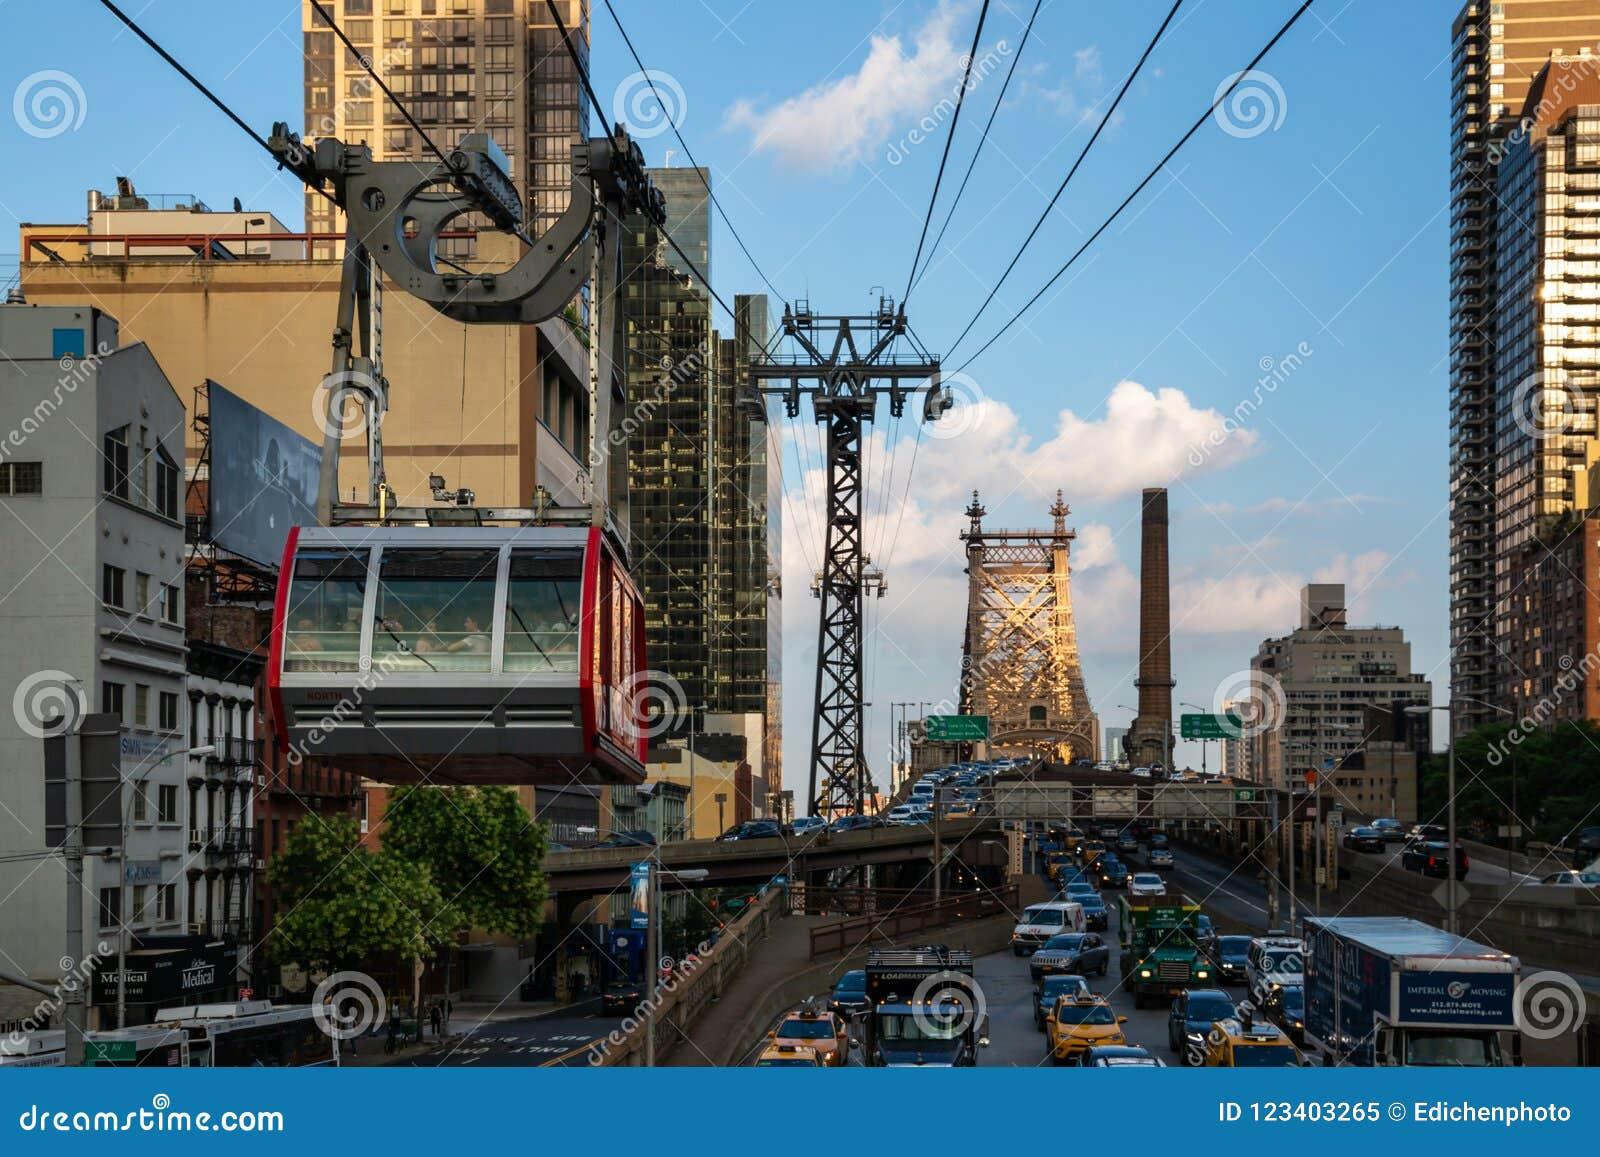 New York City / USA - JUL 27 2018: Roosevelt Island Tramway at 59th street midtown Manhattan New York City